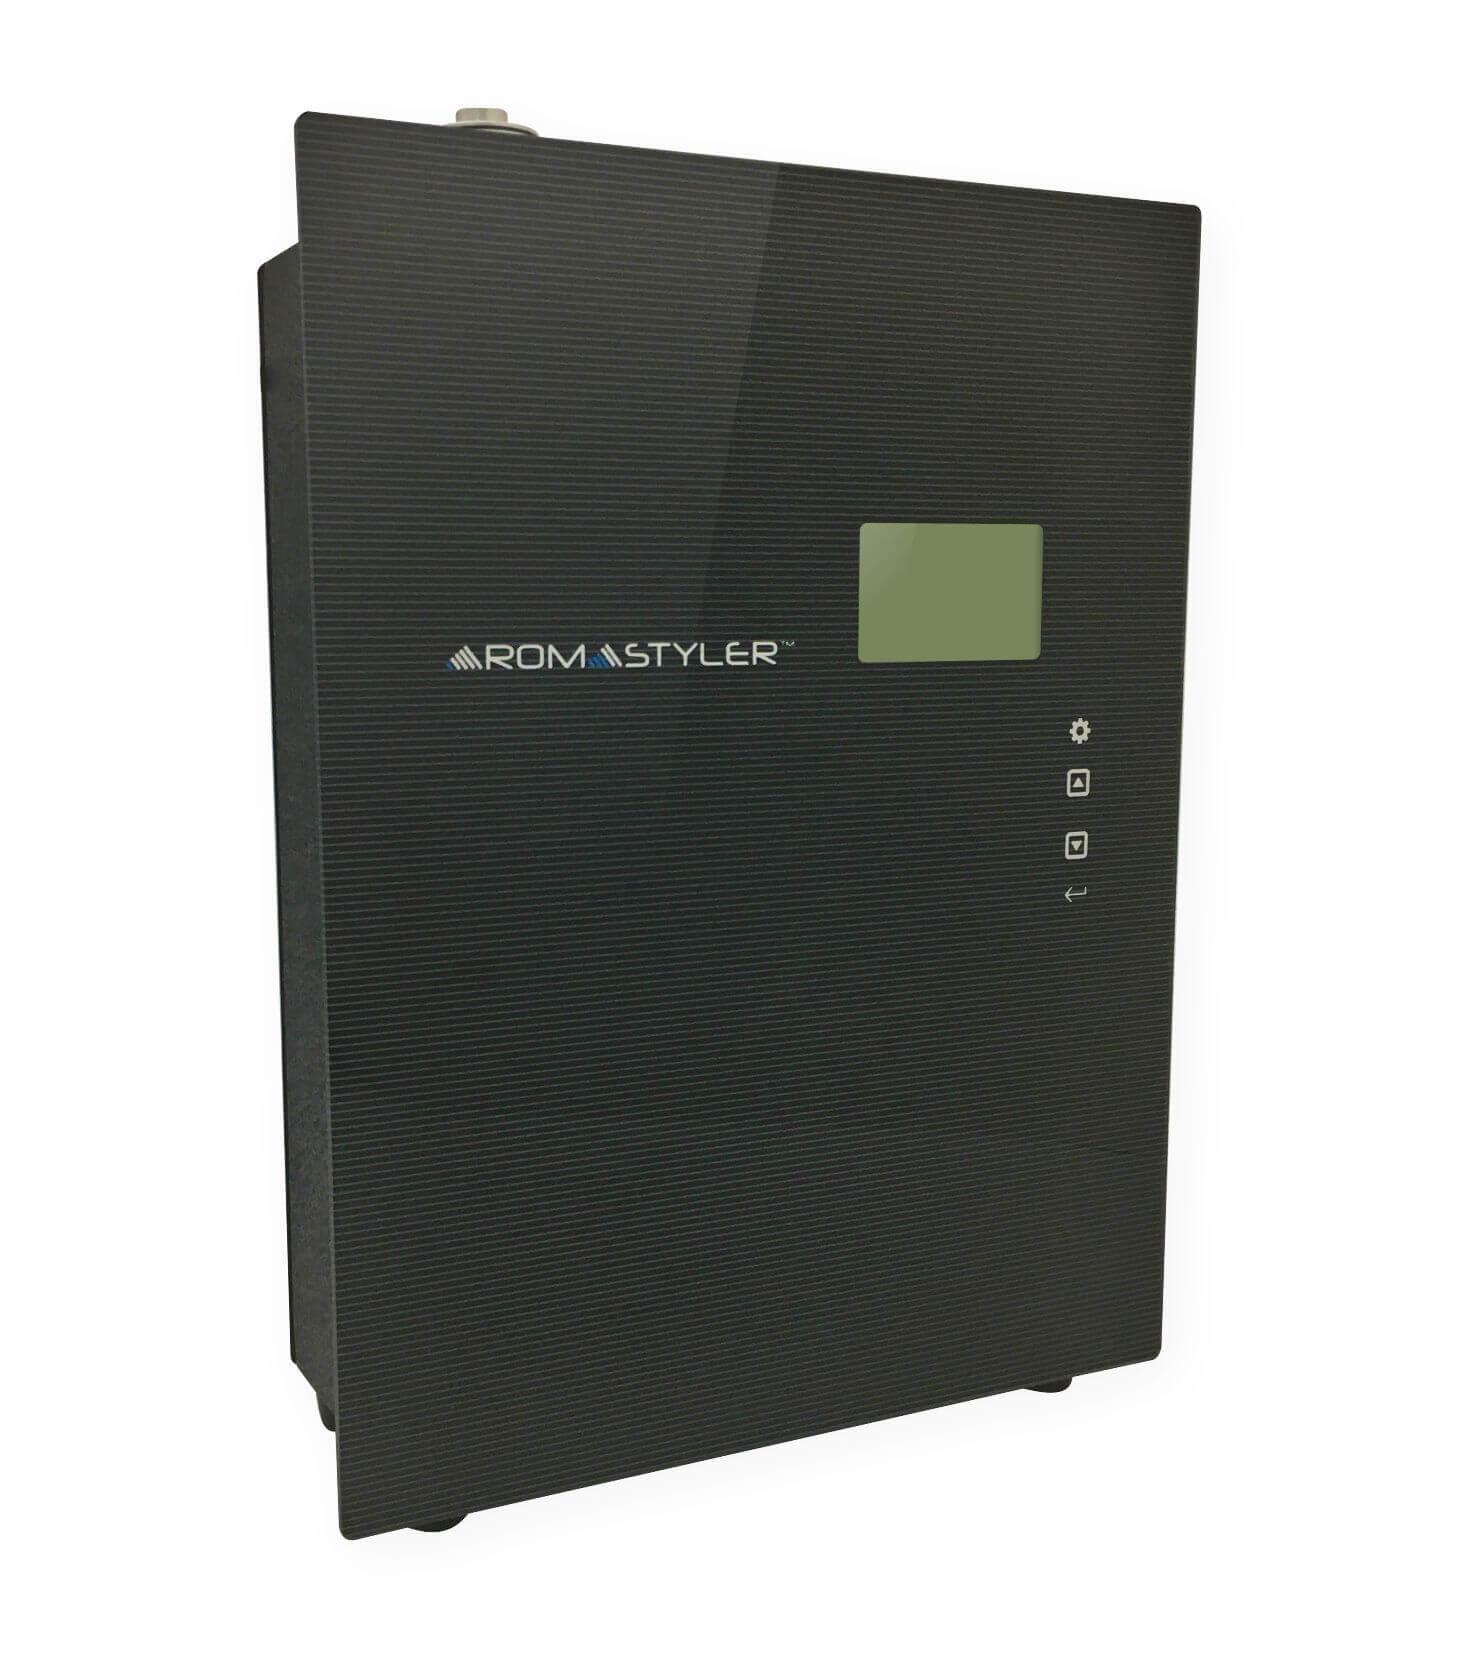 The Aroma Styler HVAC Air Freshener Diffuser System